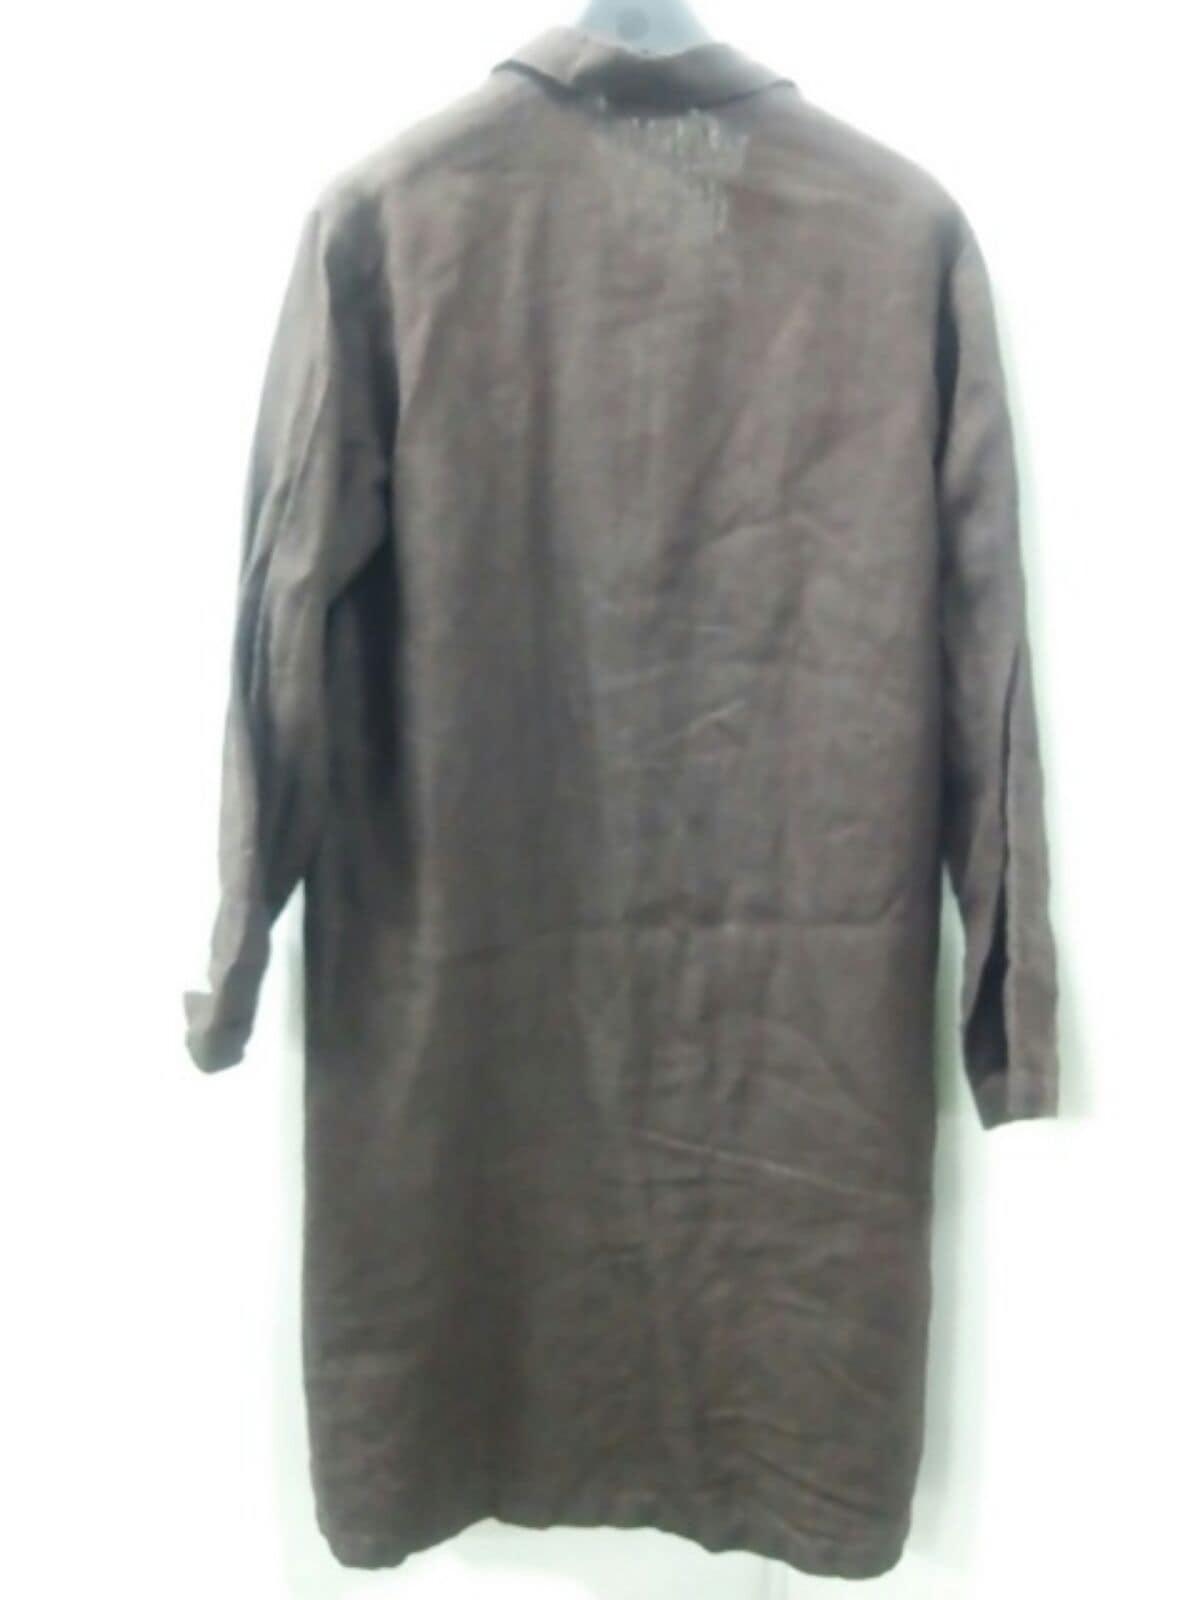 fog linen work(フォグリネンワーク)のジャケット